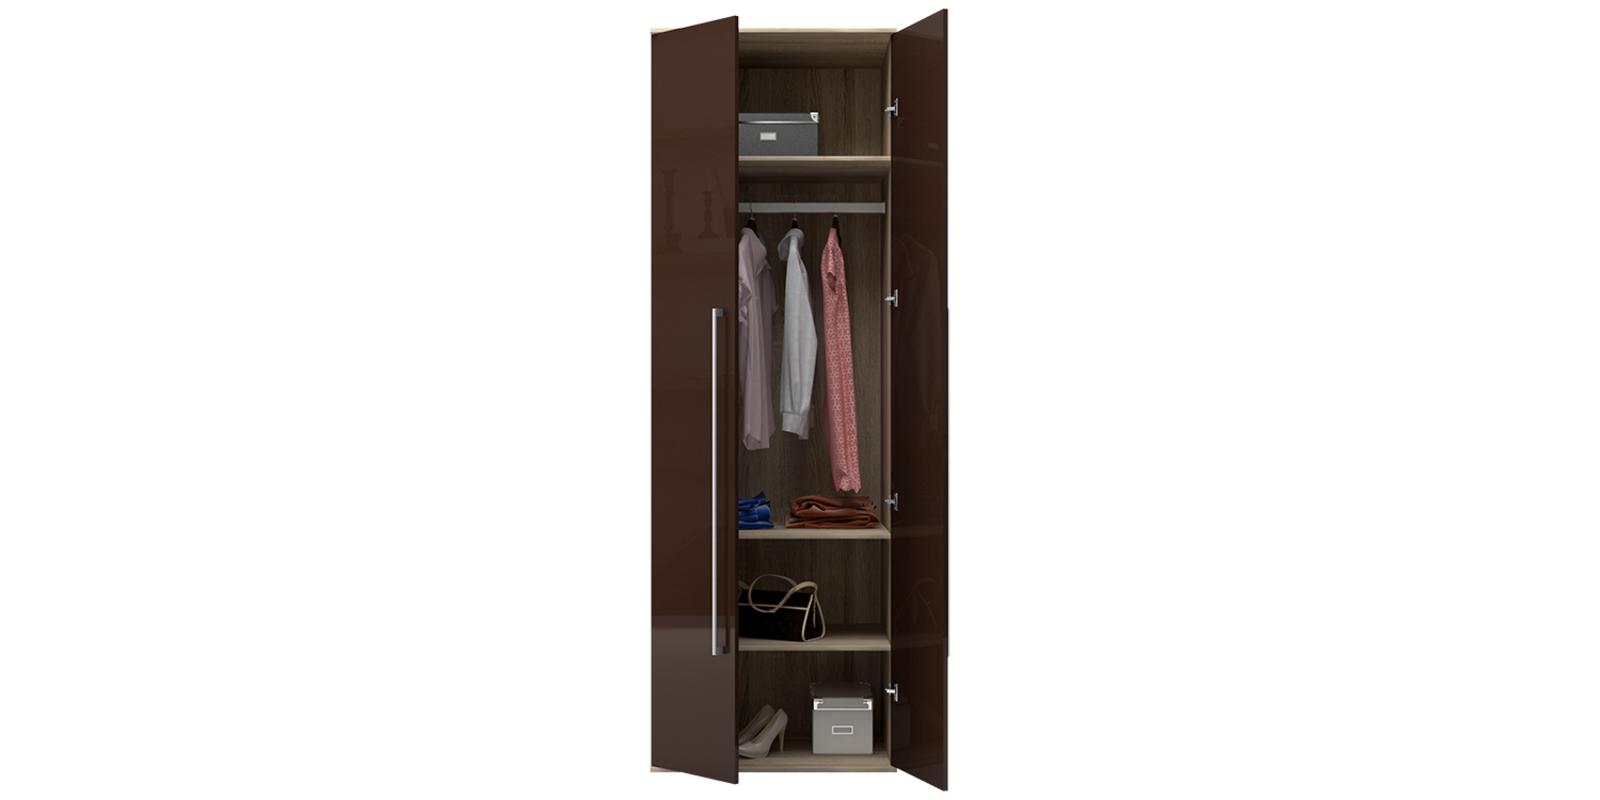 Шкаф распашной двухдверный Бали вариант №1 (шоколад глянец/дуб сонома) от HomeMe.ru